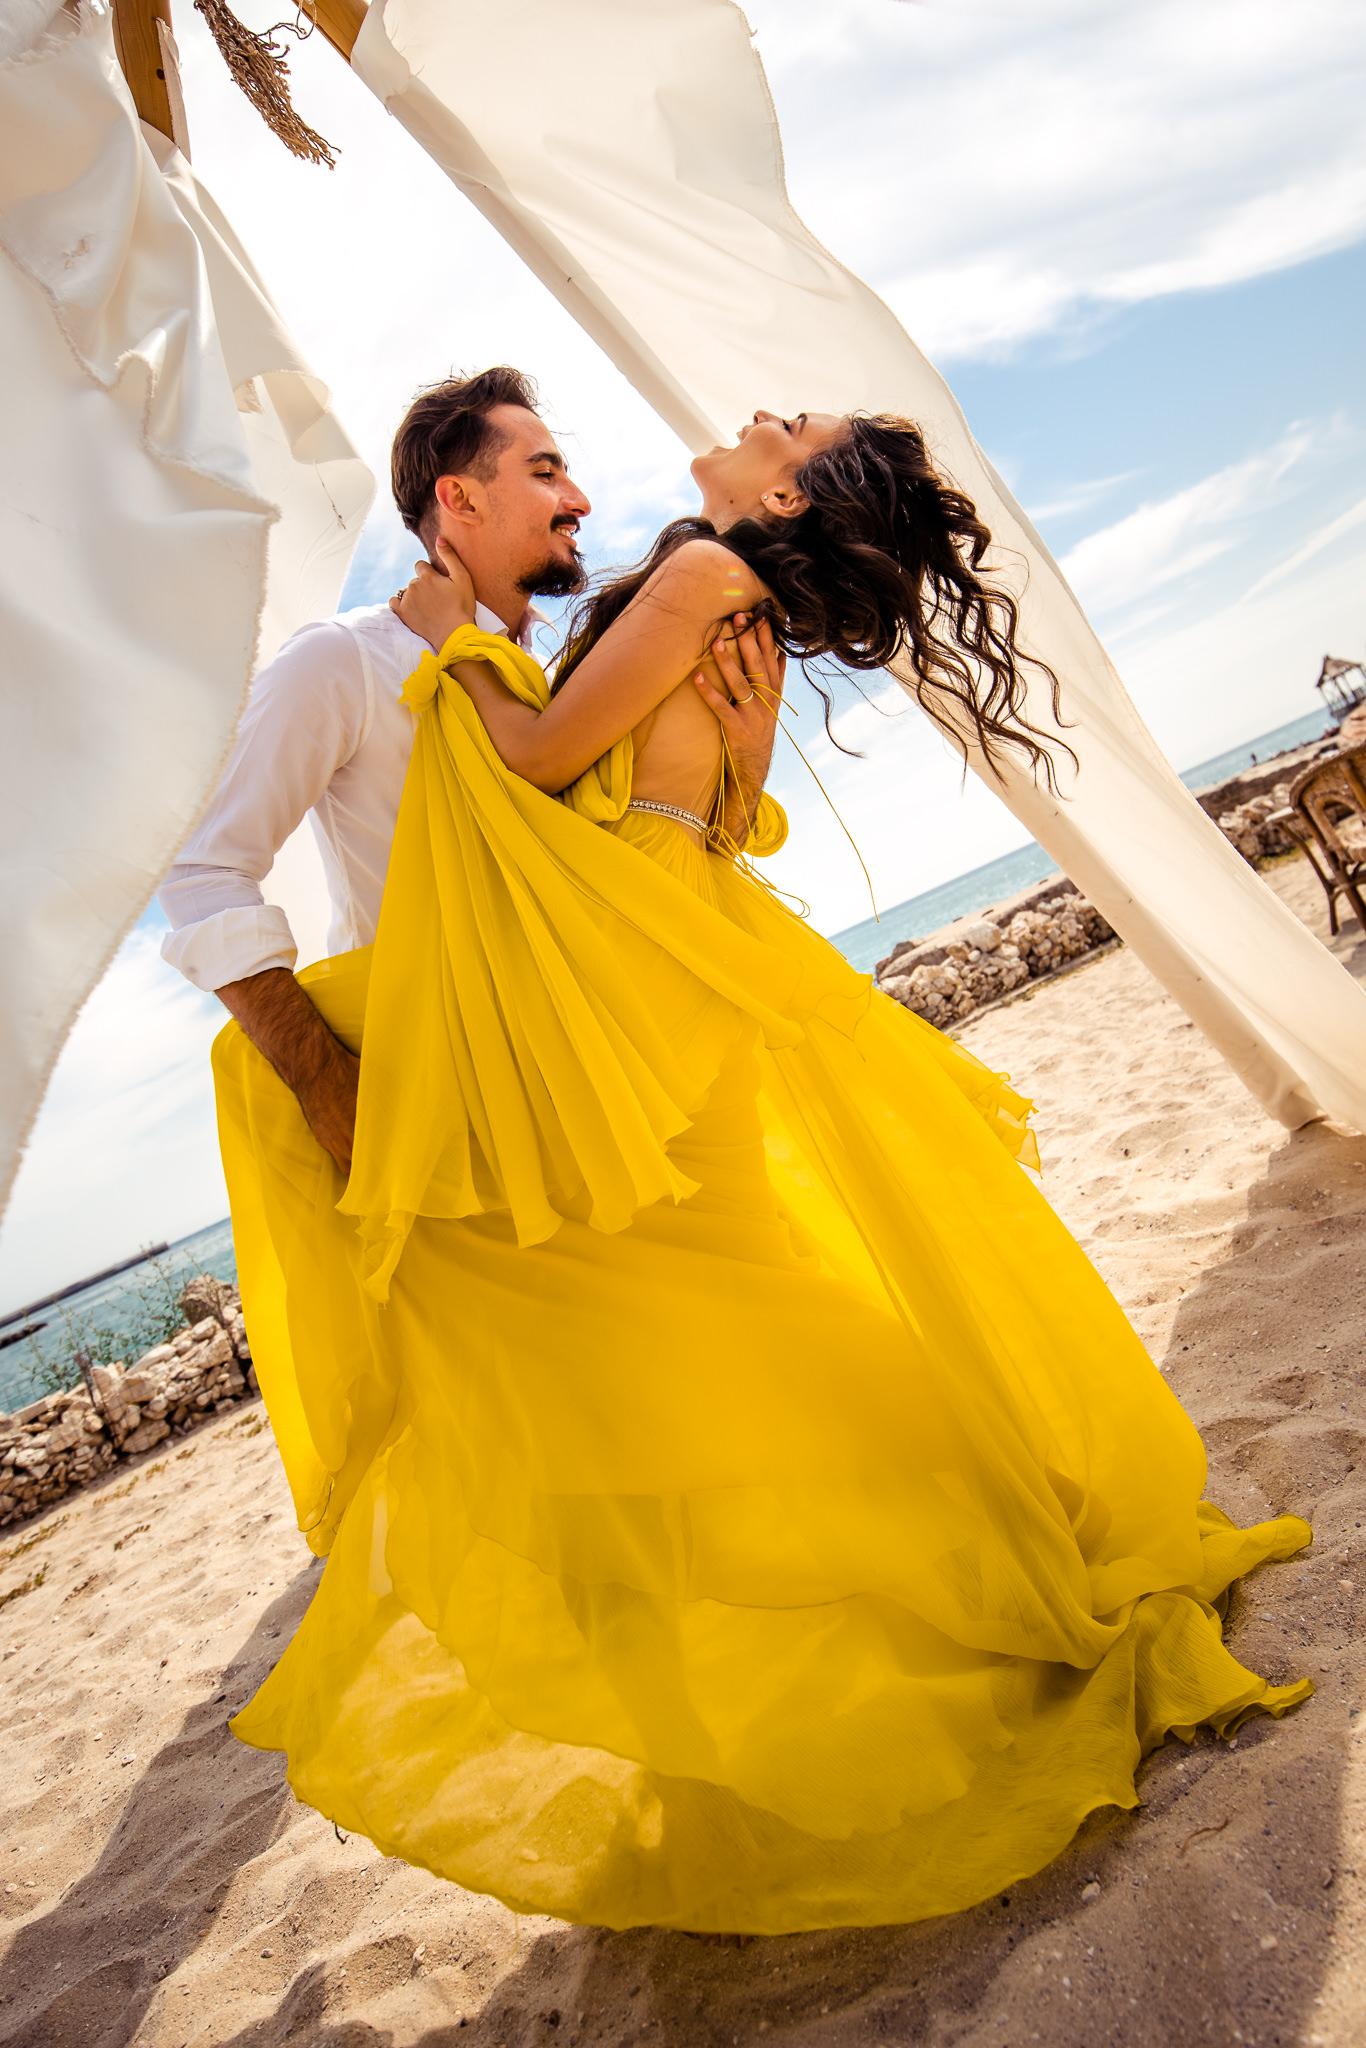 Sinzi & Alex – Trash the dress